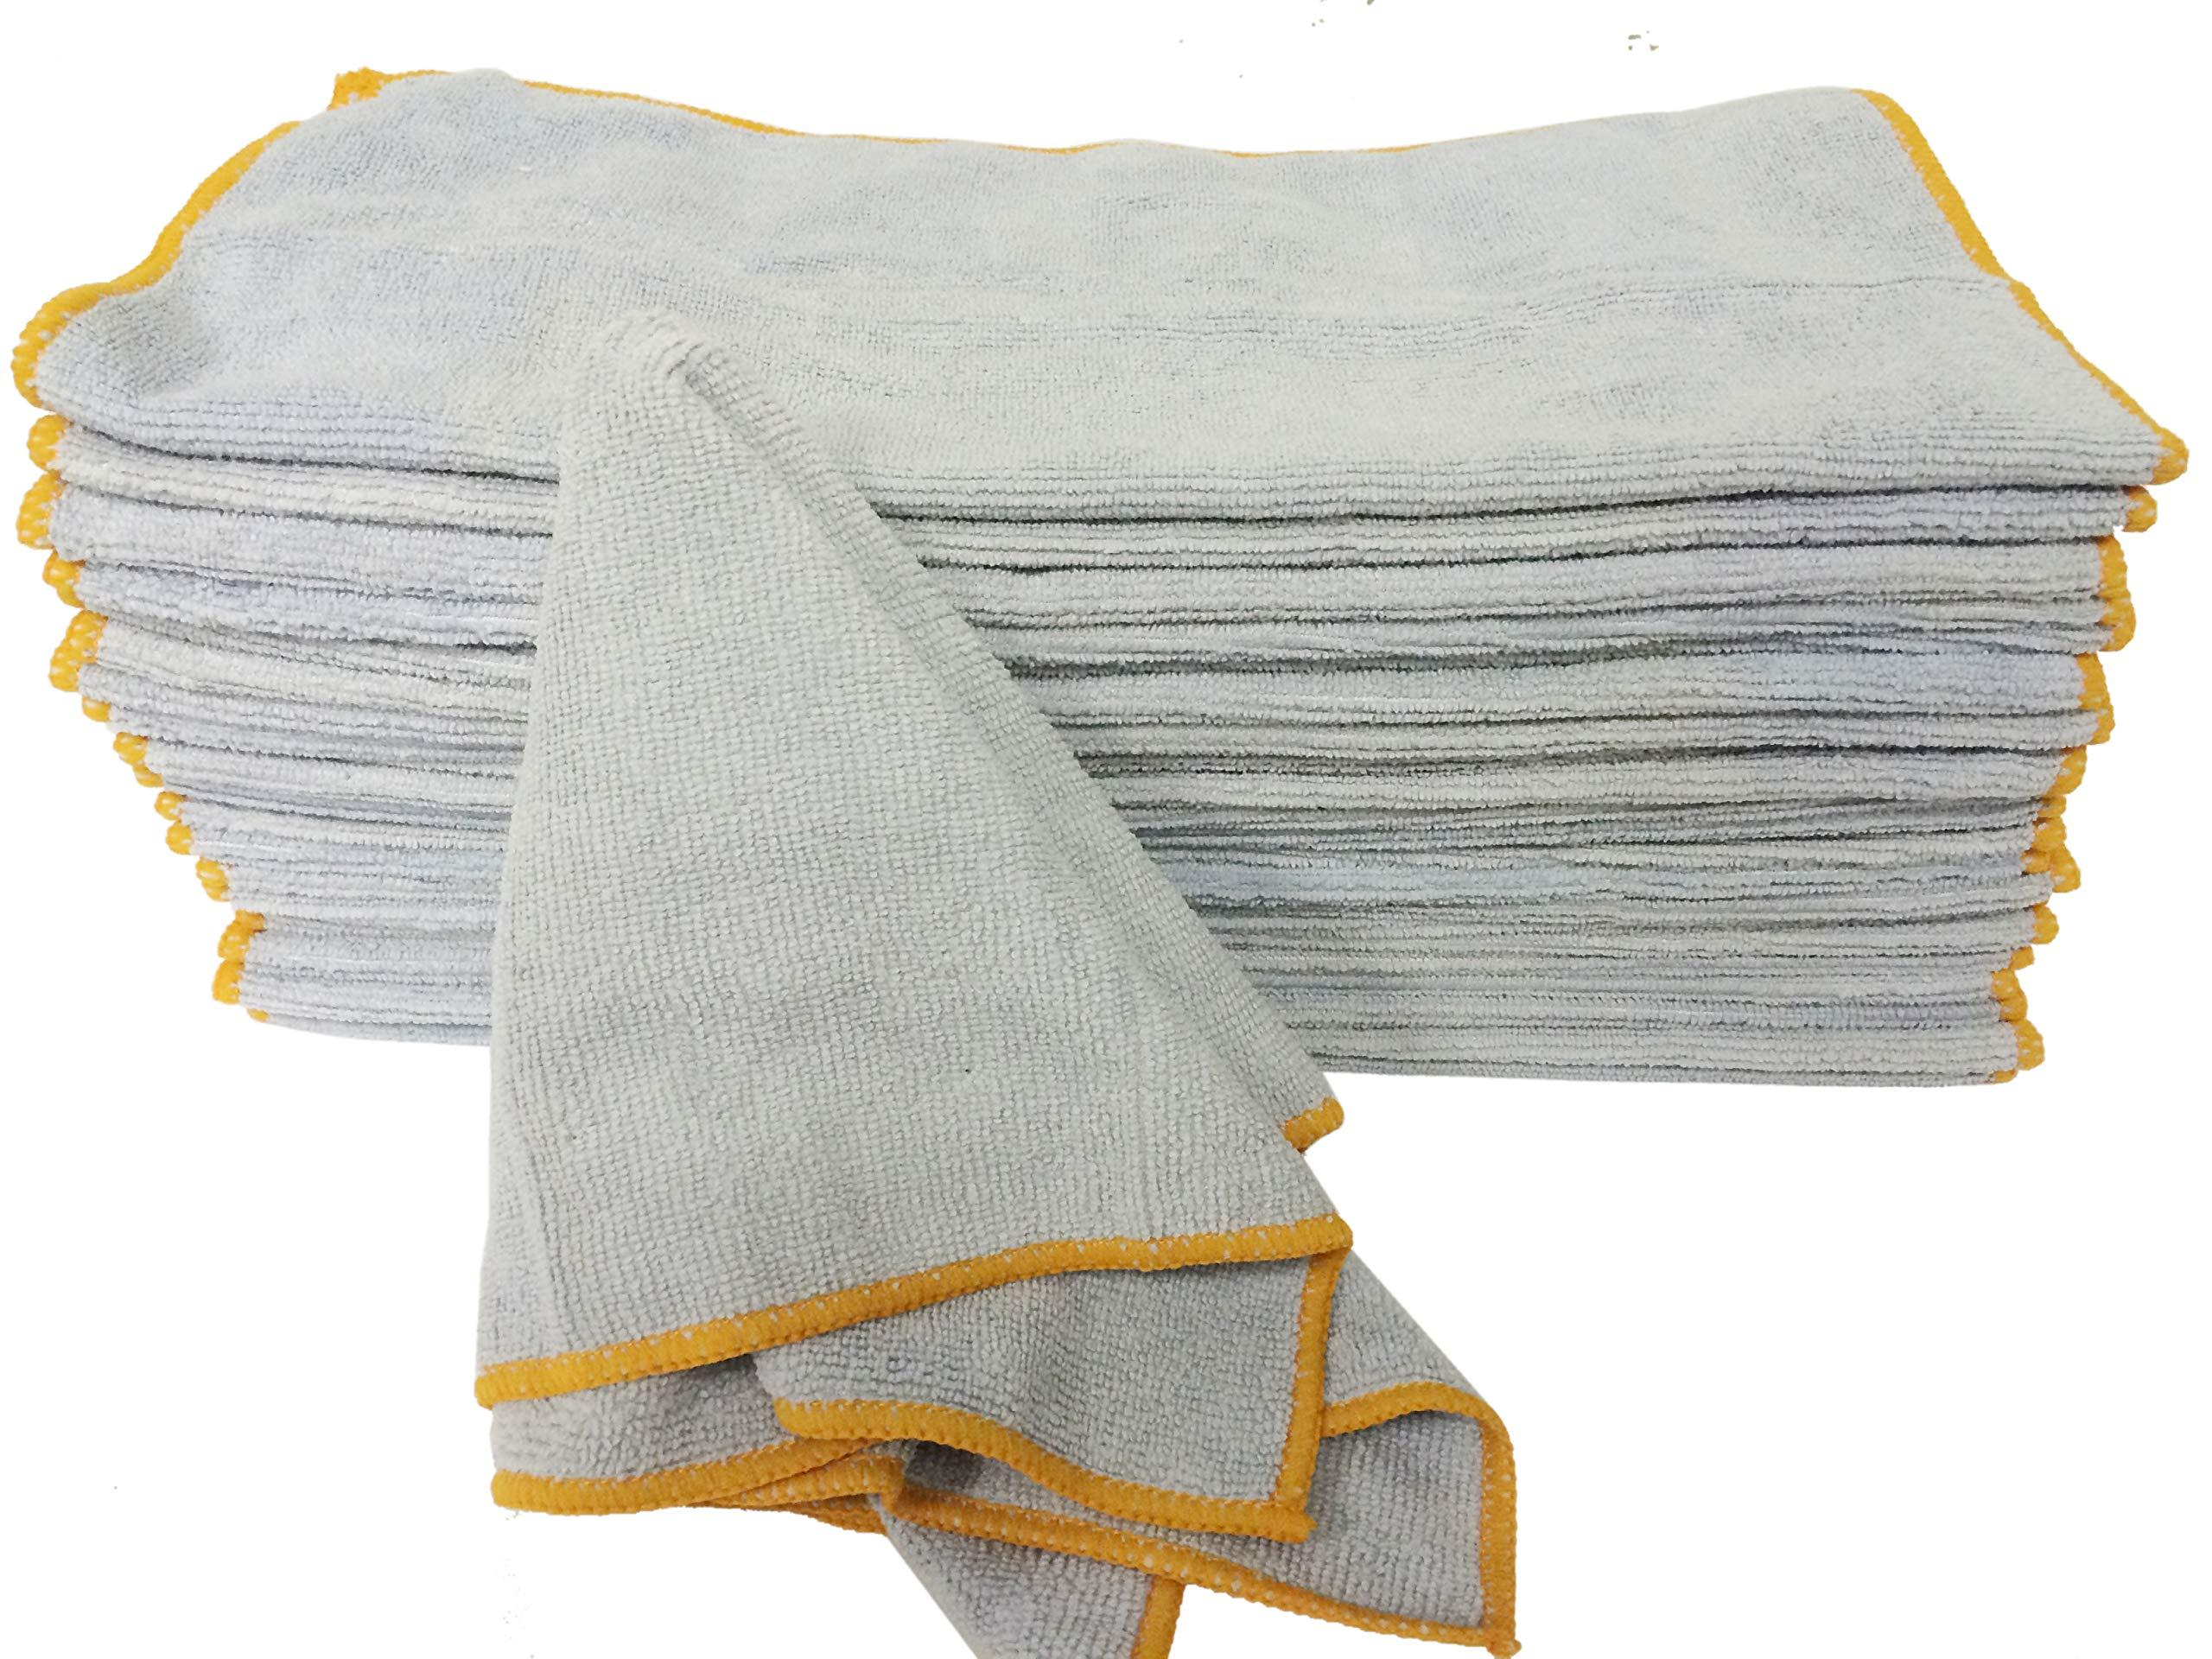 ATLAS ''B Grade Bulk Microfiber 300 Pieces Towel Cloth - Gray, Size 13x13 - for Auto, Home, Office, Restaurant, Salon, Spa and Garage - Lint-Free